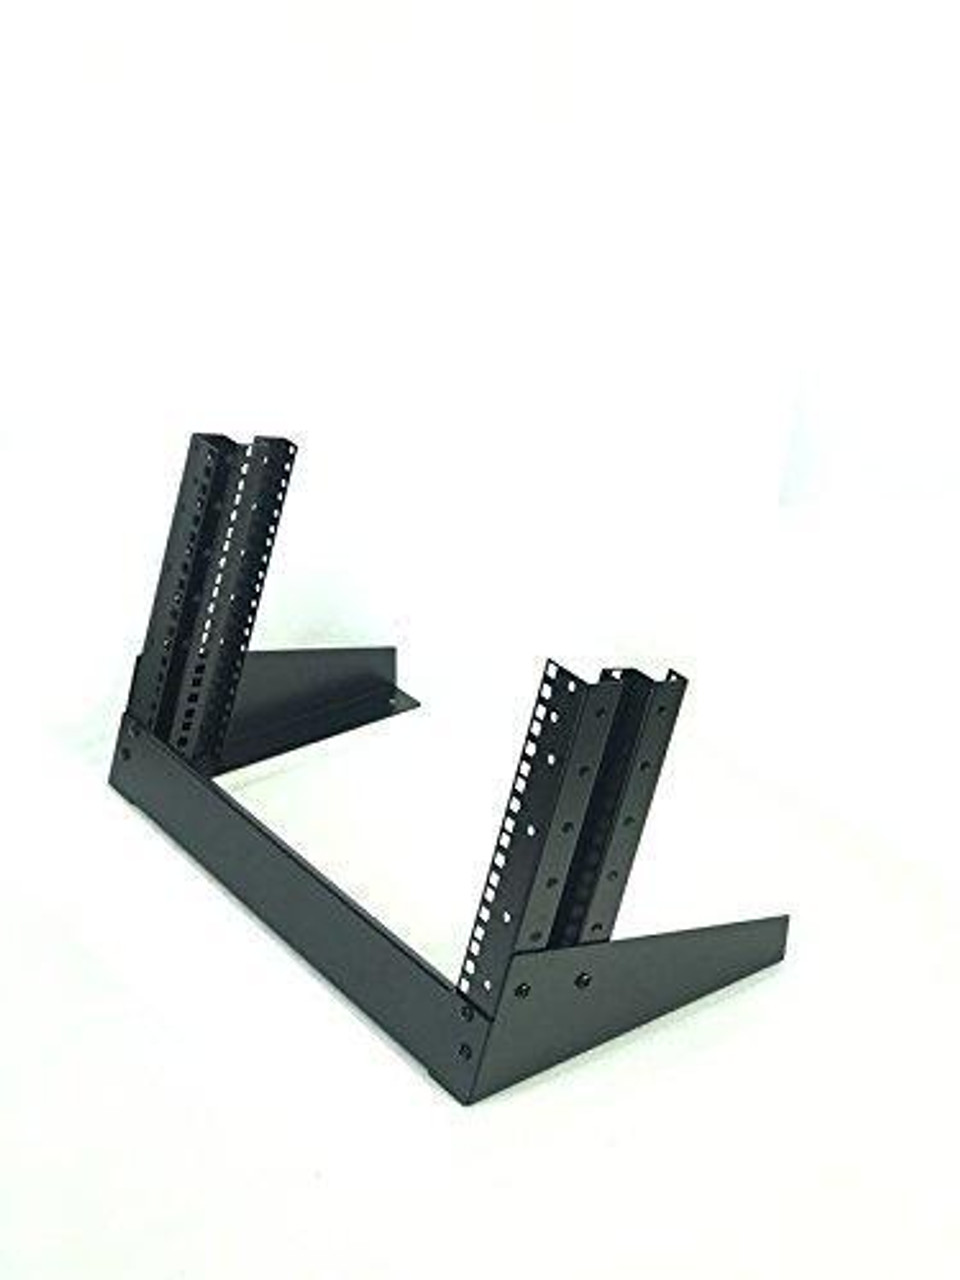 Raising 6U Stand Open rack Equipment fram for server networking and data system